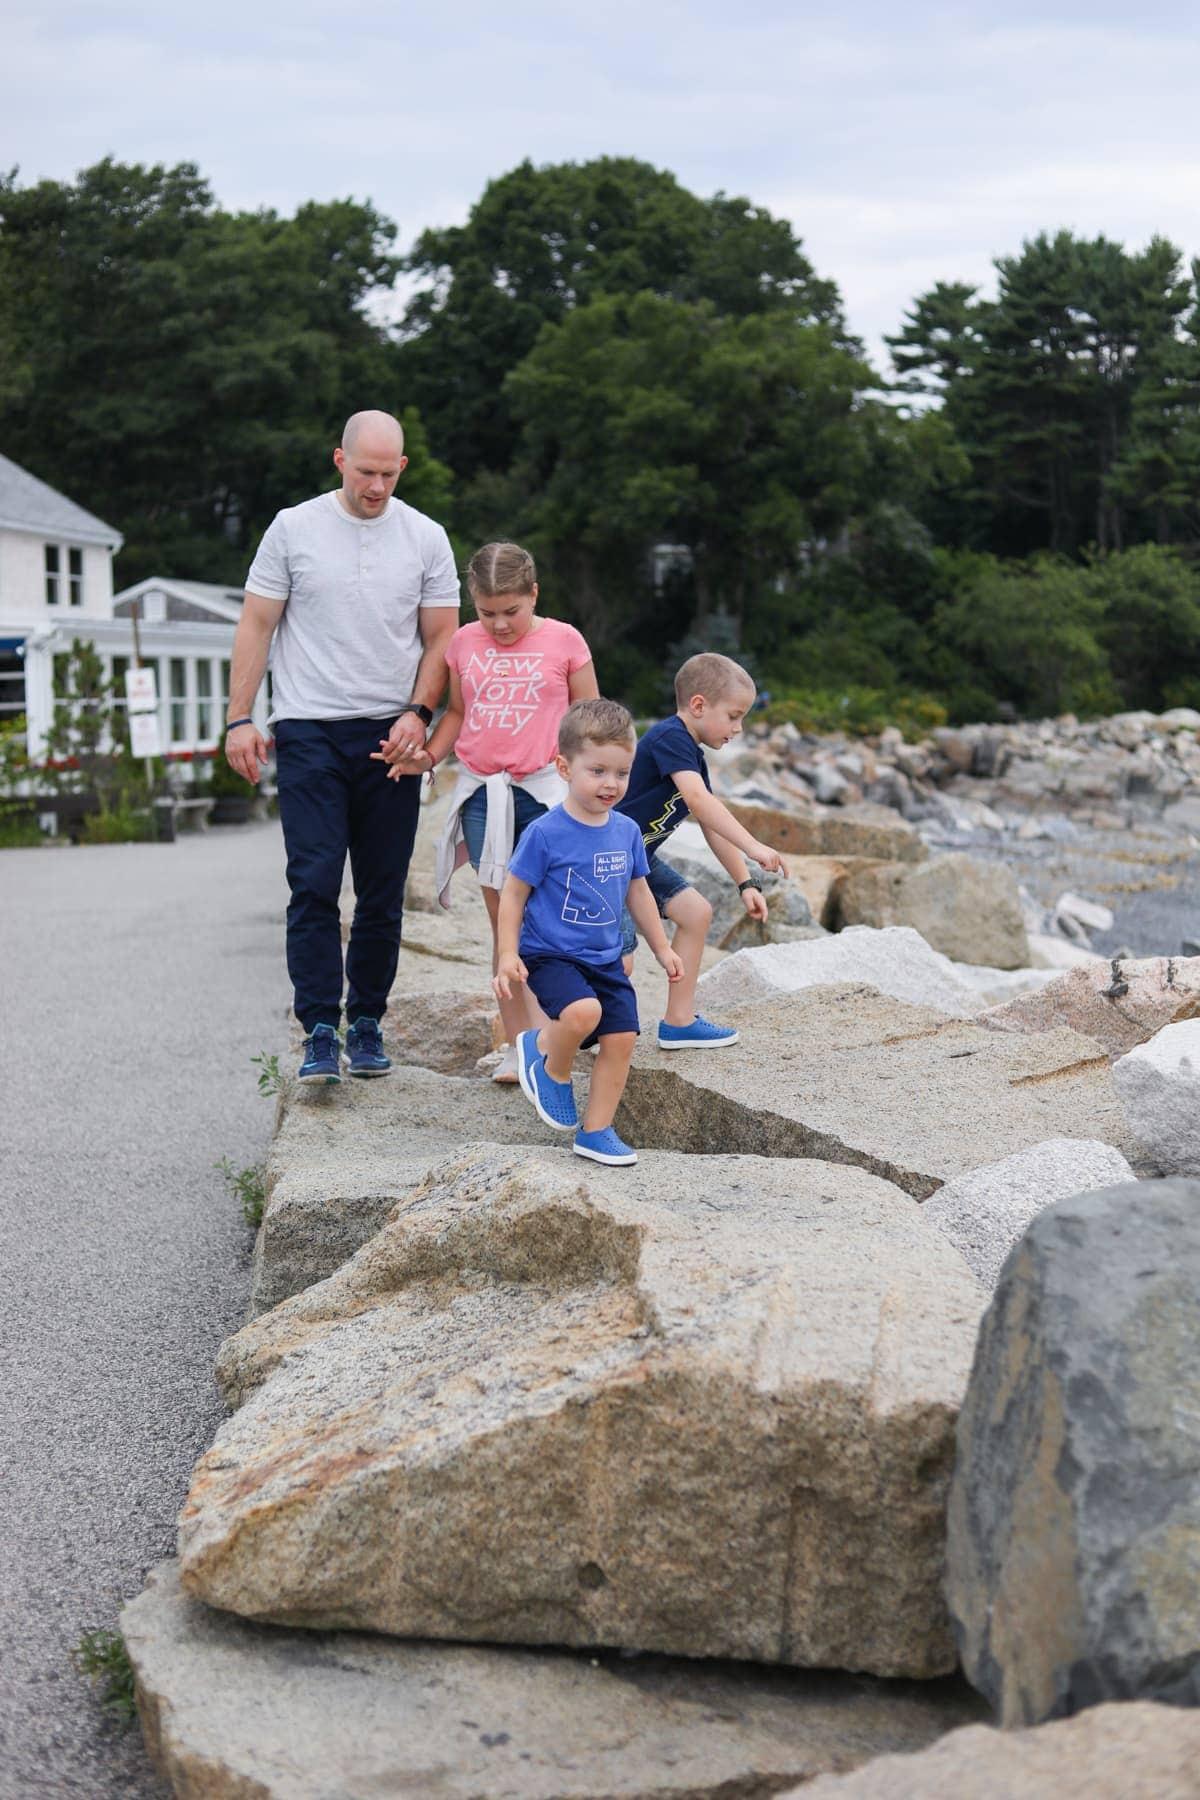 Gordon and the kids climbing on rocks